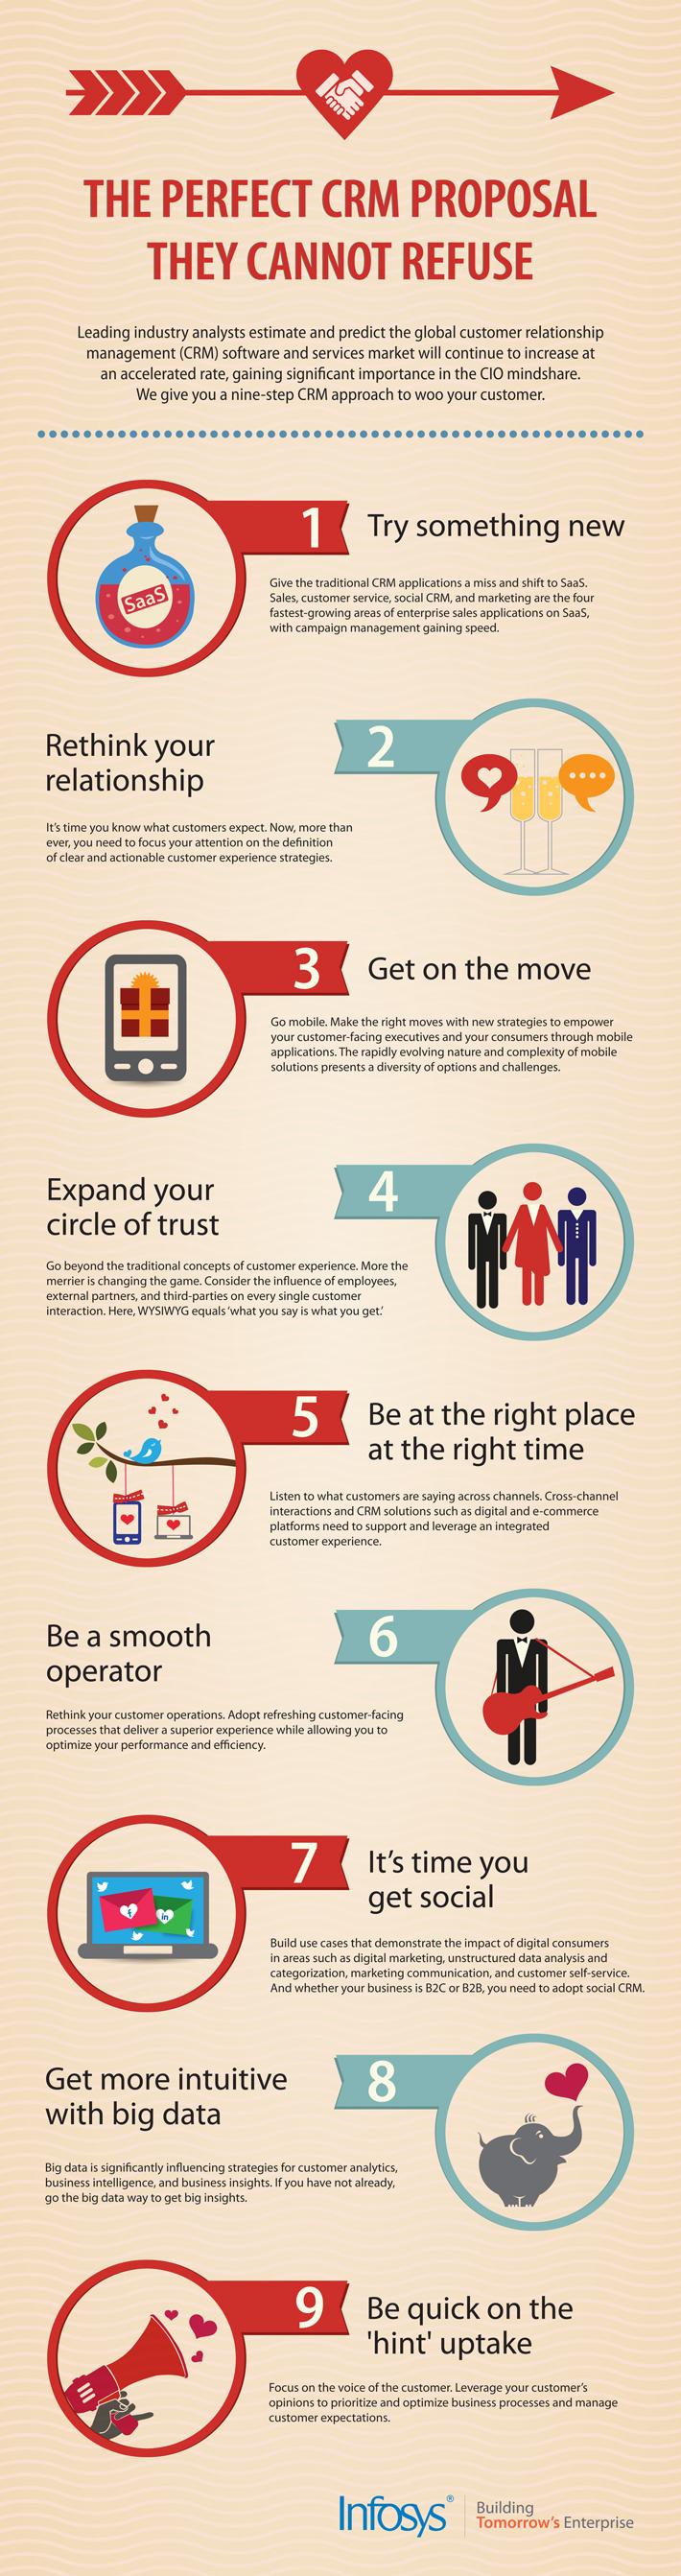 Proposal on customer relationship management